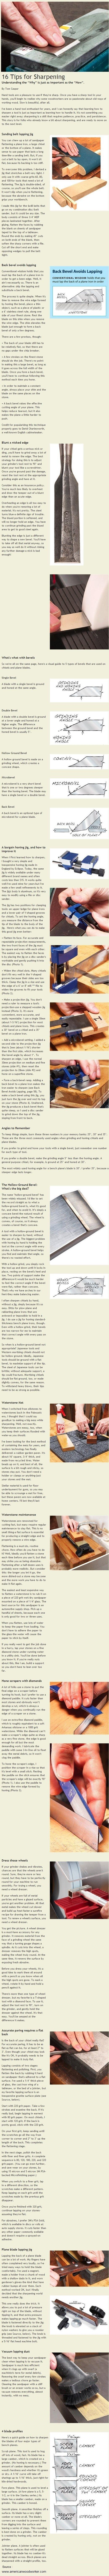 16 Tips for Sharpening